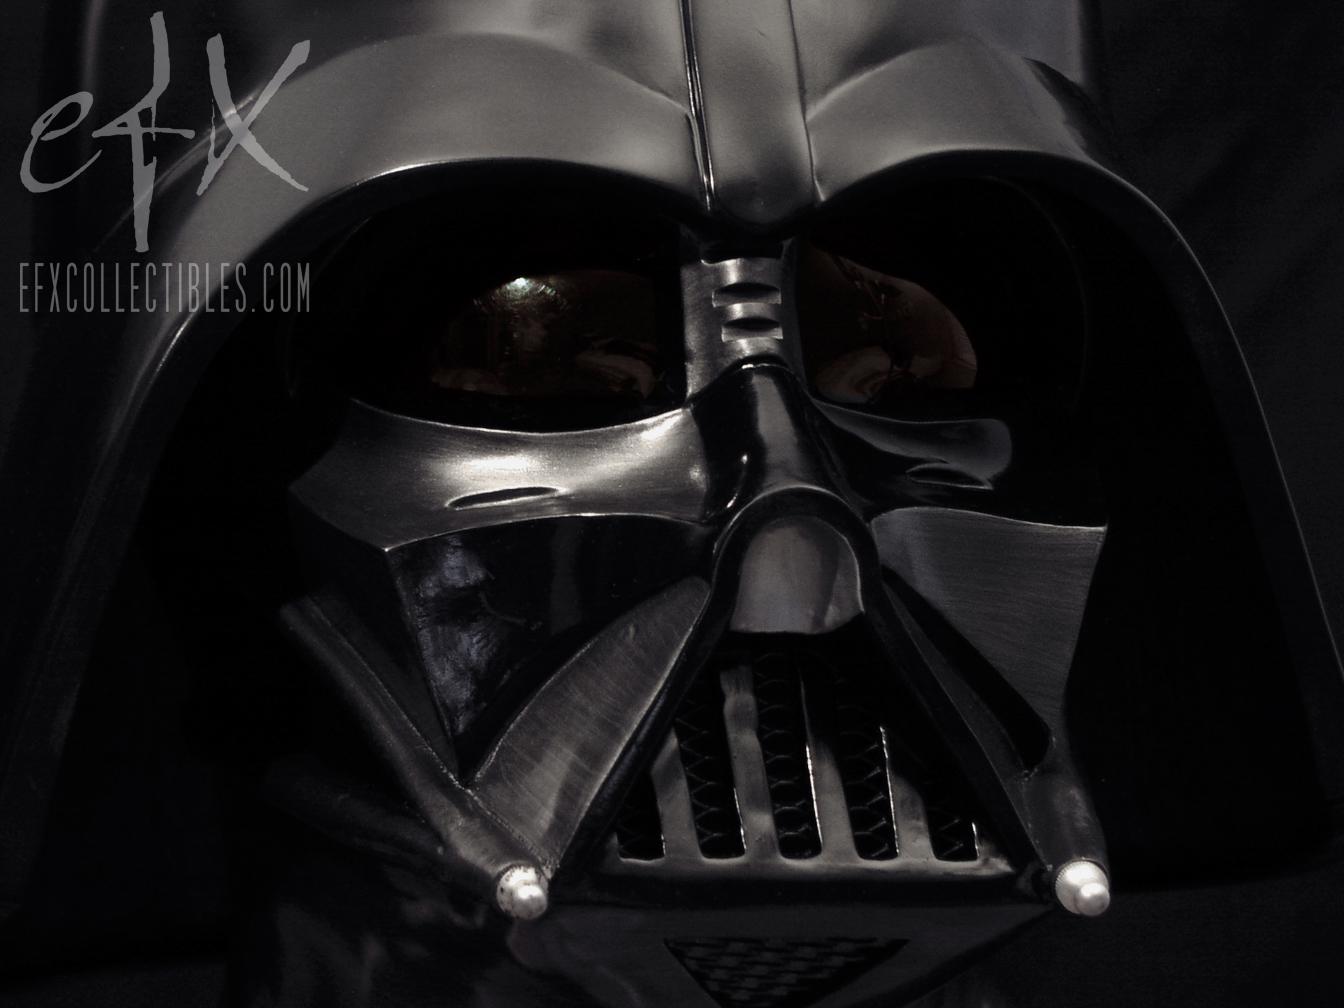 Vader personals